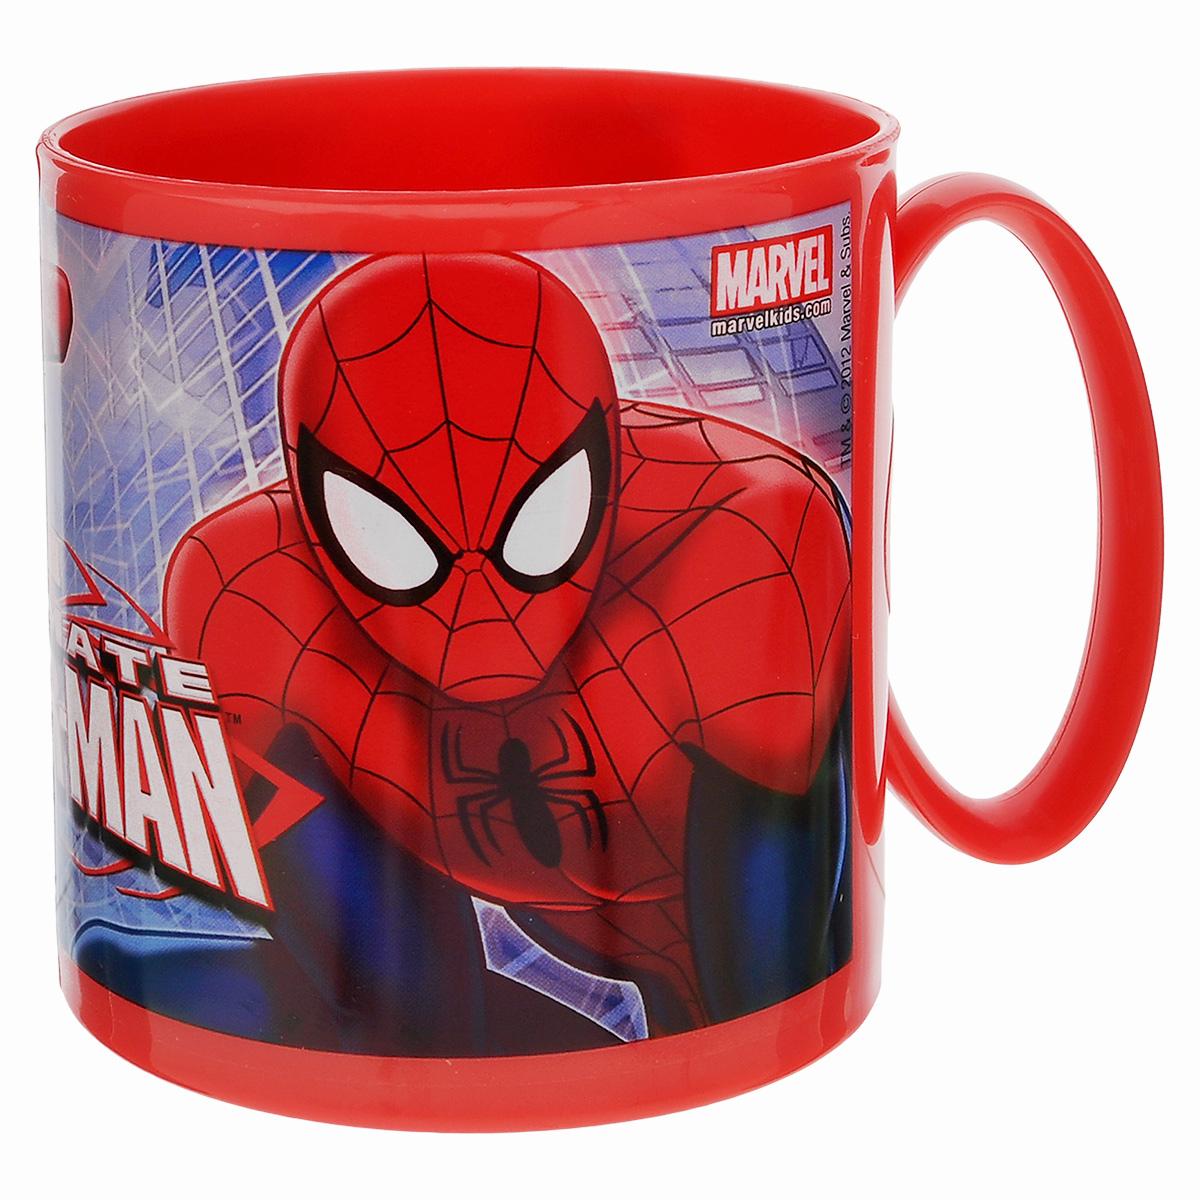 "Кружка Marvel ""Spider-Man"", цвет: красный, 350 мл"